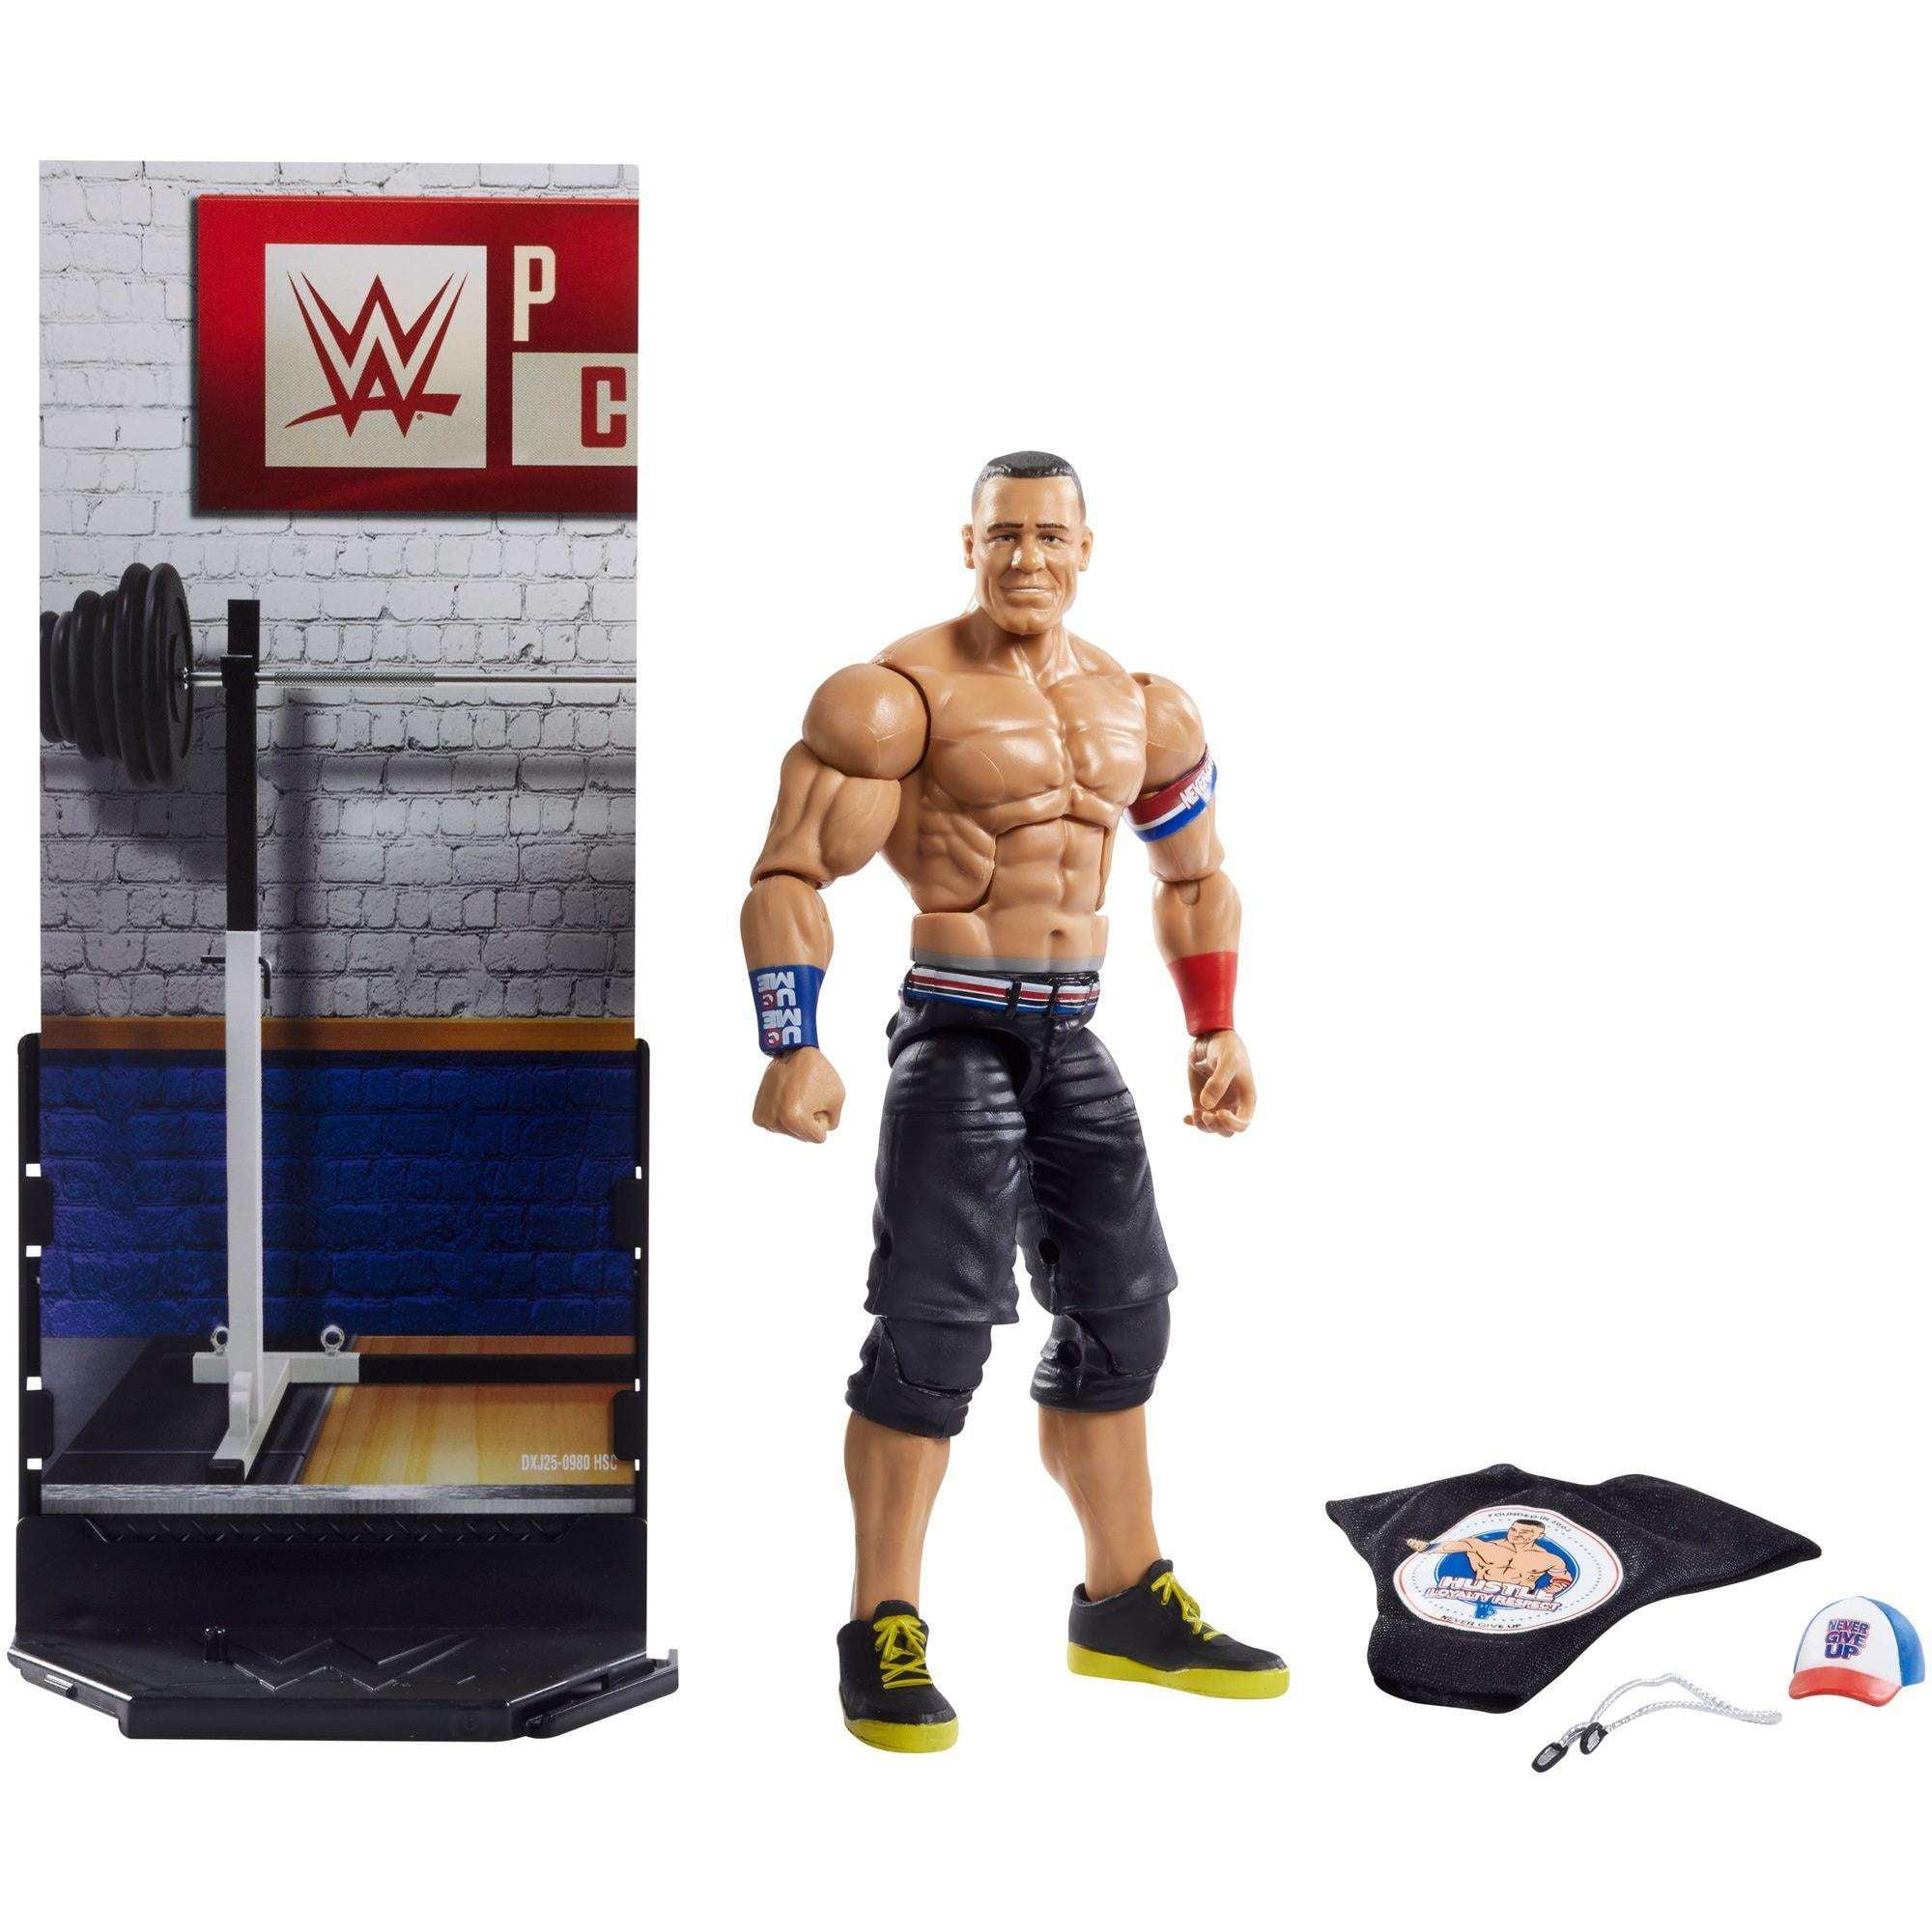 WWE Elite Collection John Cena Action Figure by Mattel